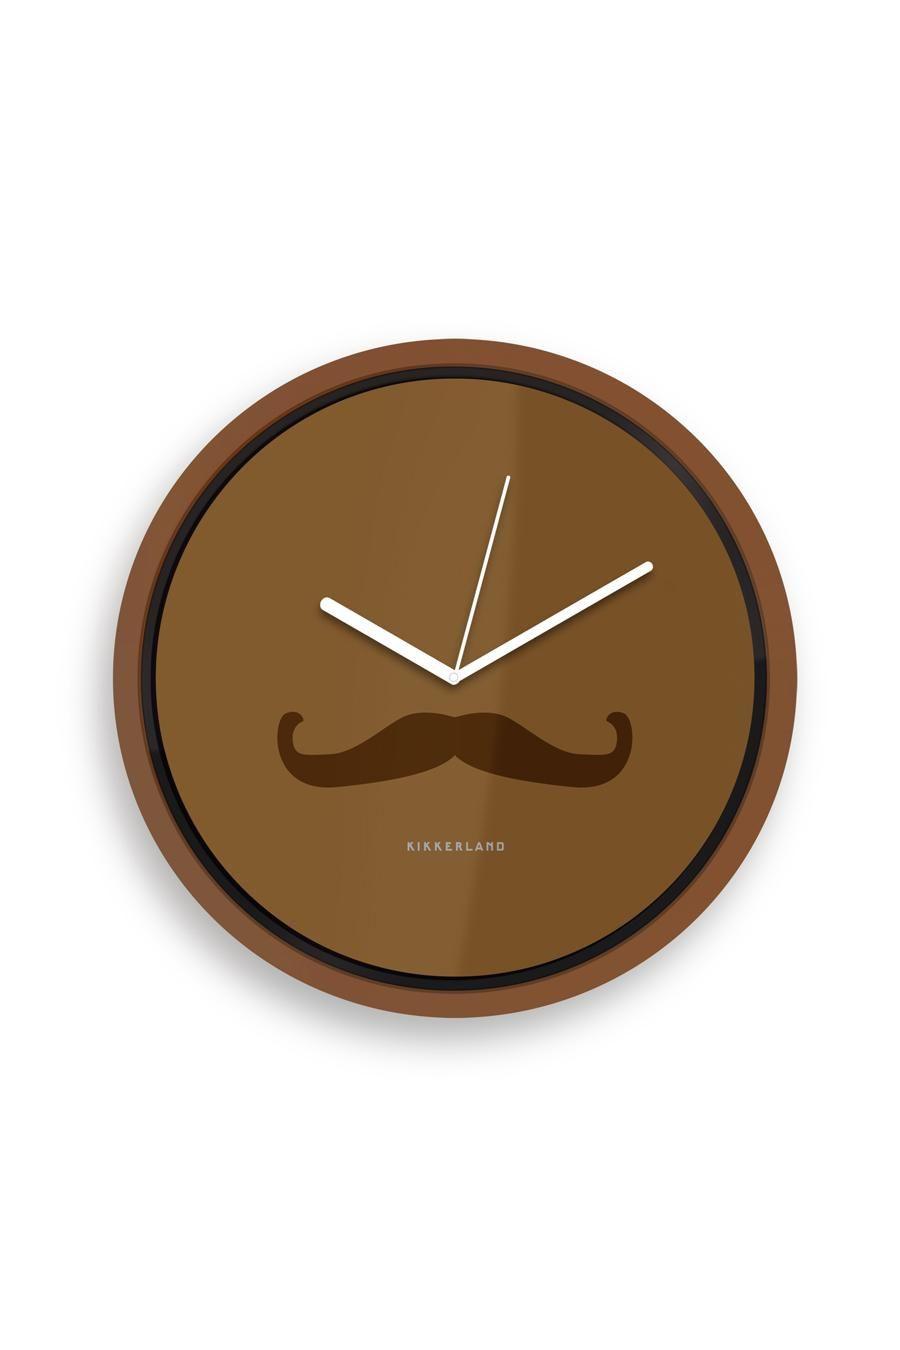 Mustache Wall Clock For The Man Cave Objetos Casa Pinterest